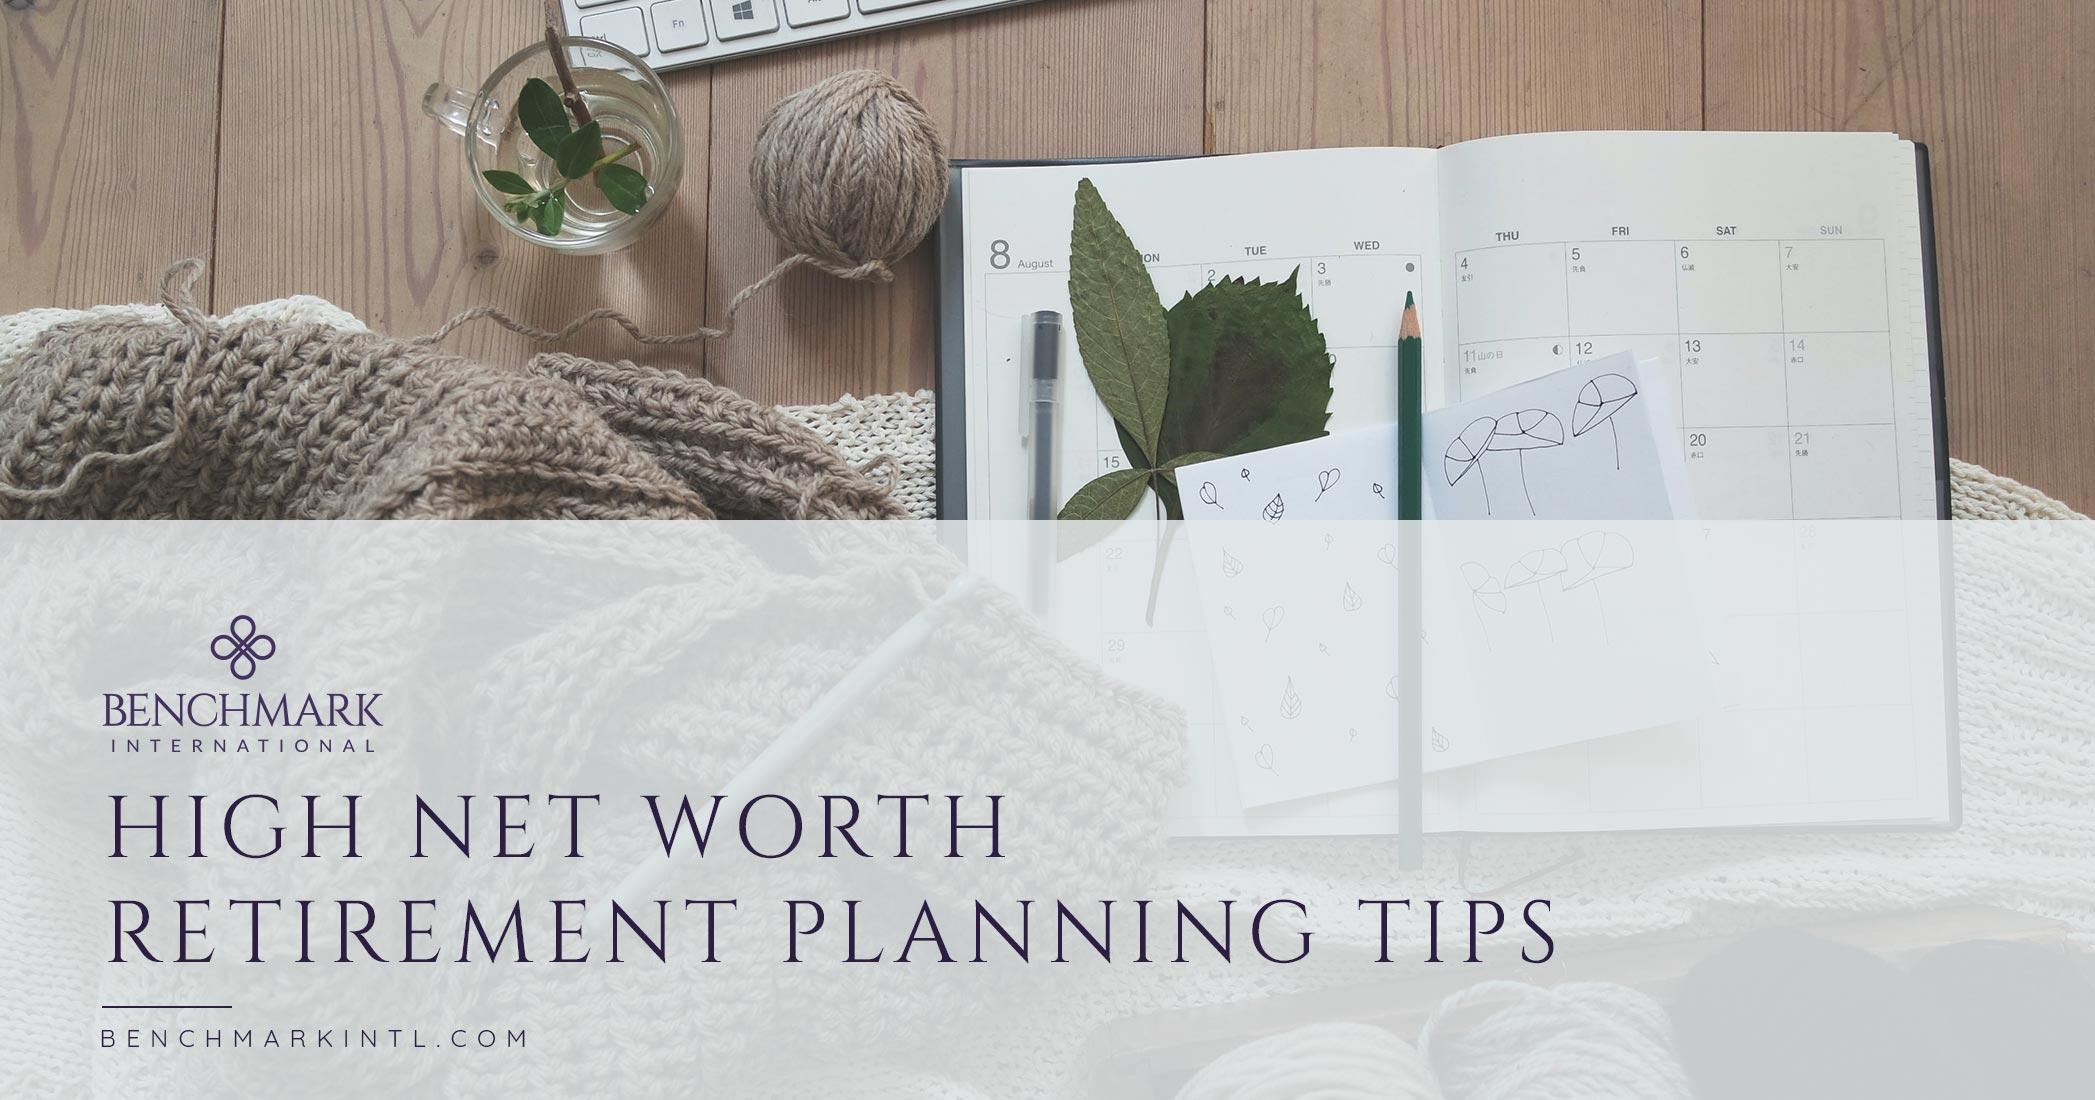 High Net Worth Retirement Planning Tips